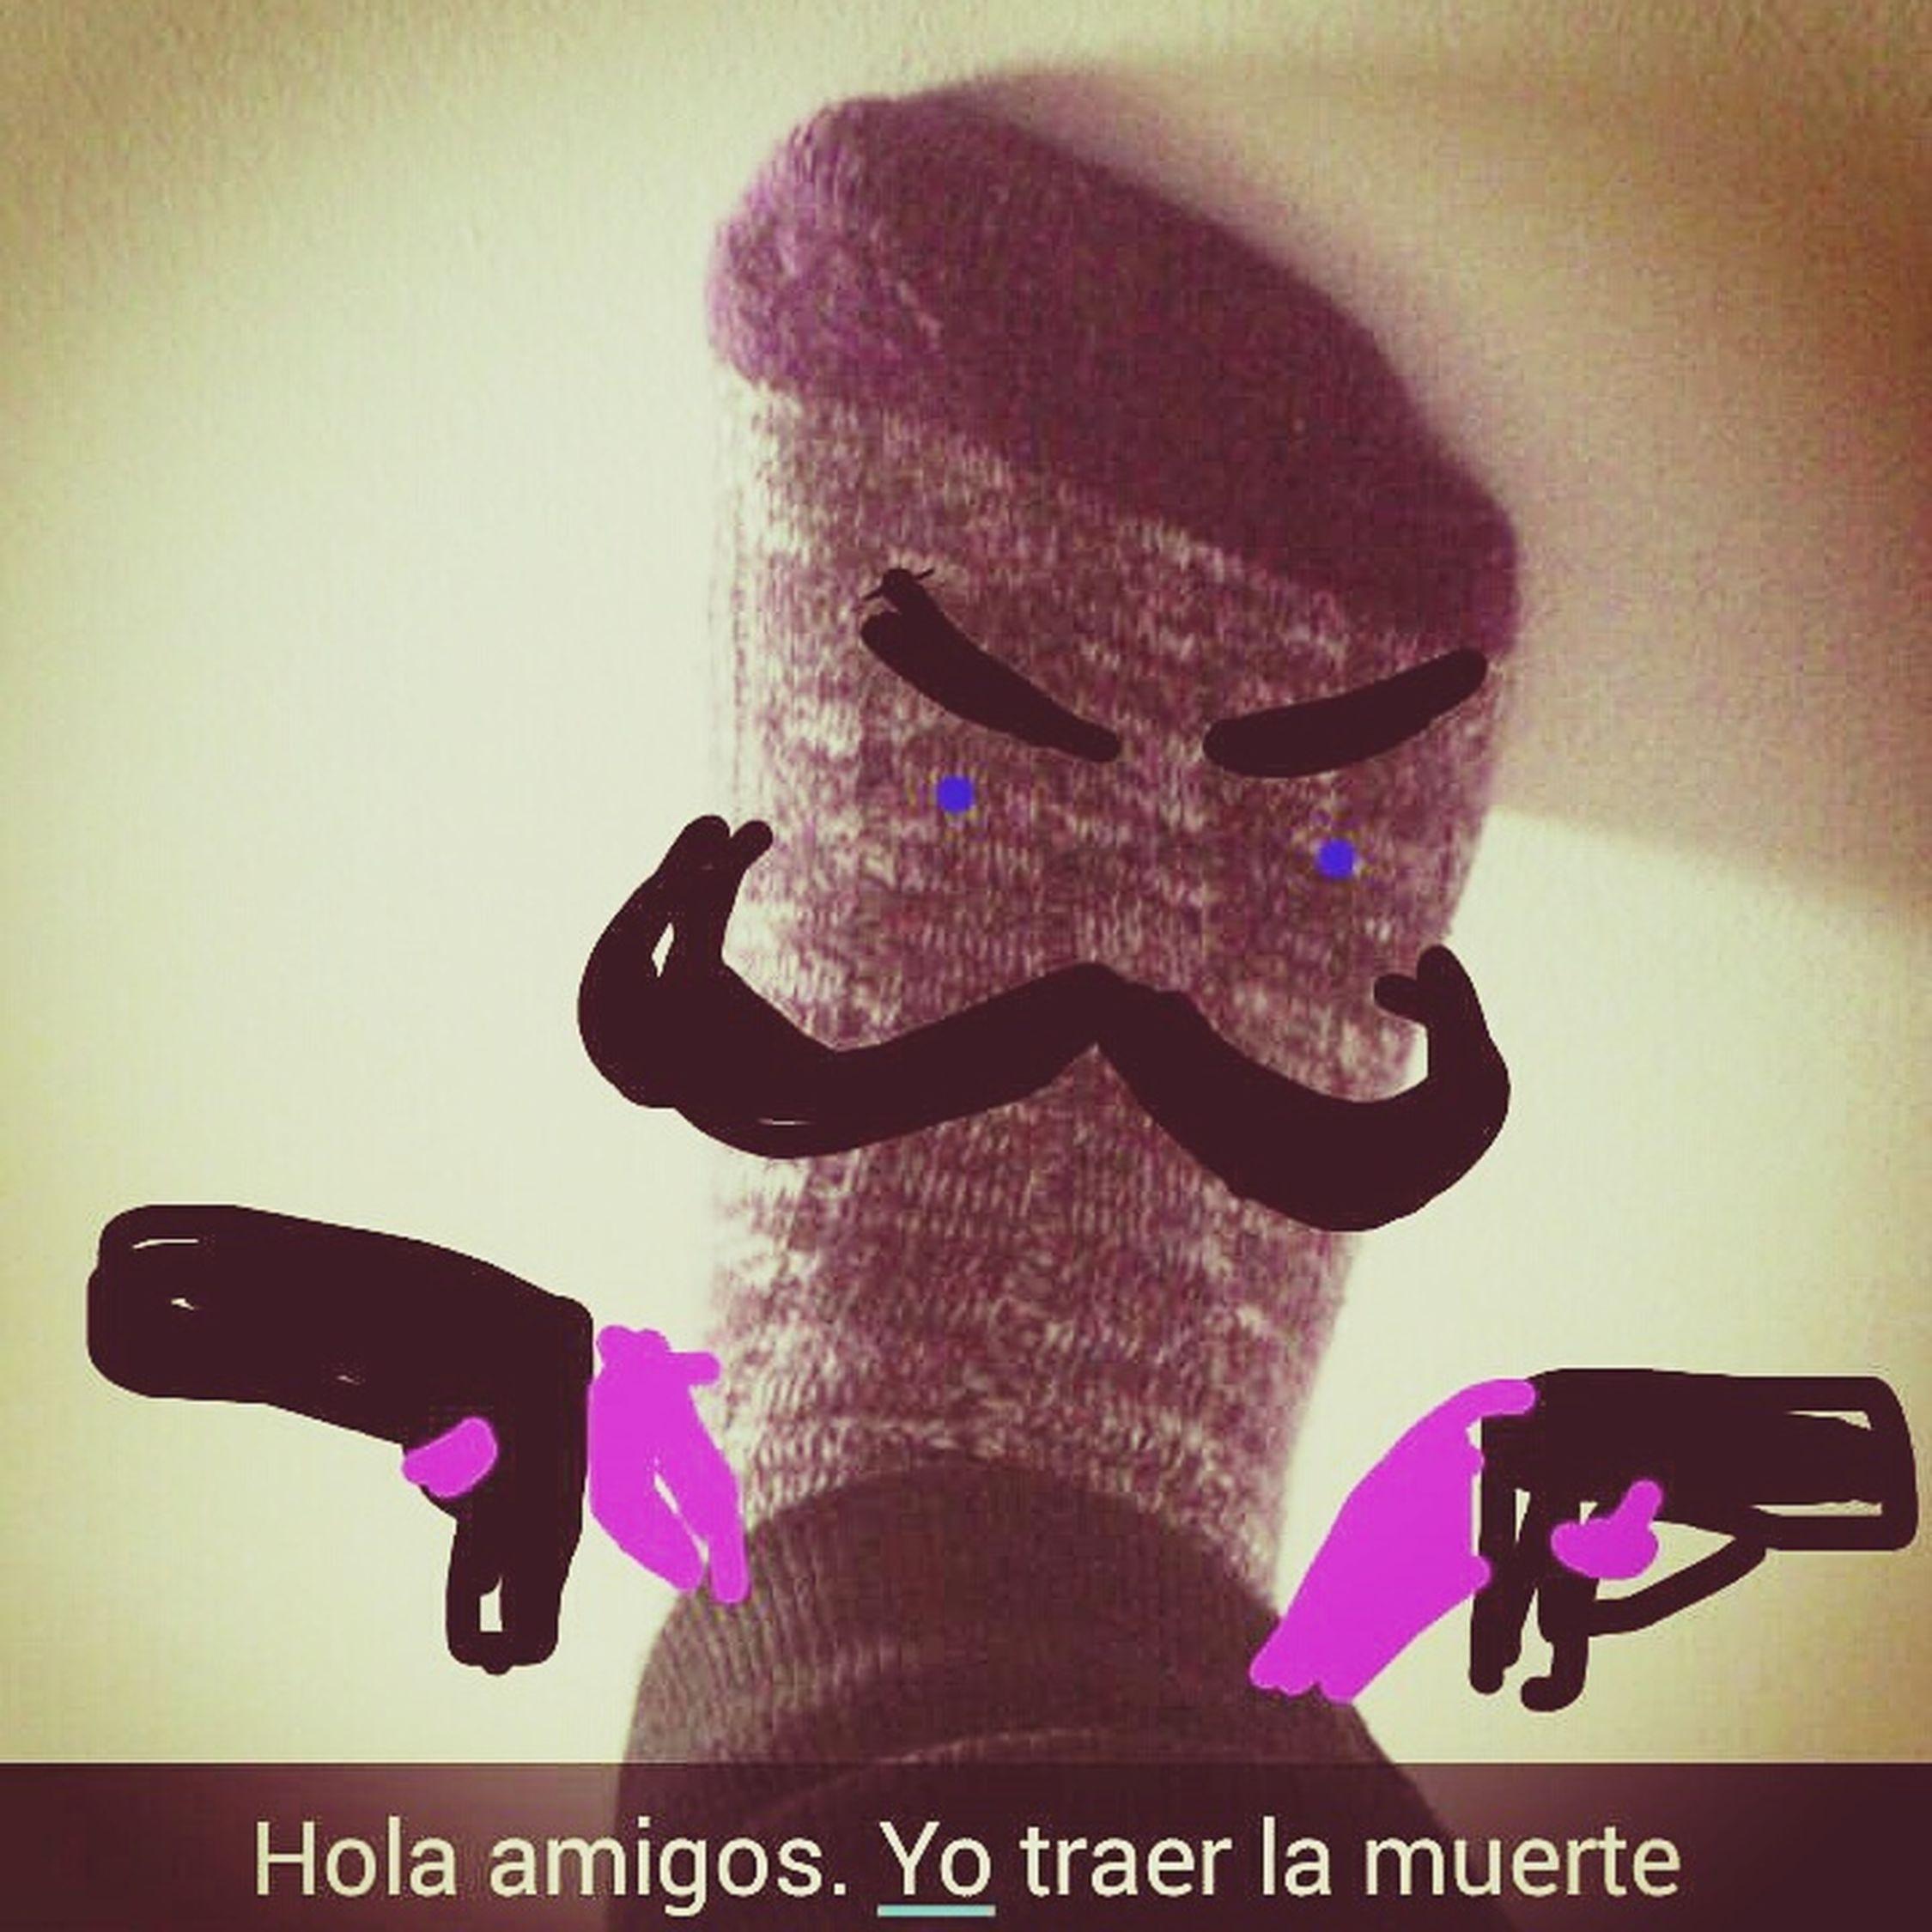 Becouse Fuck You Dontfuckwithme Hola Amigos Kill Death Selfie Myspanishsucks But I Wont Apologize Say It To My Face